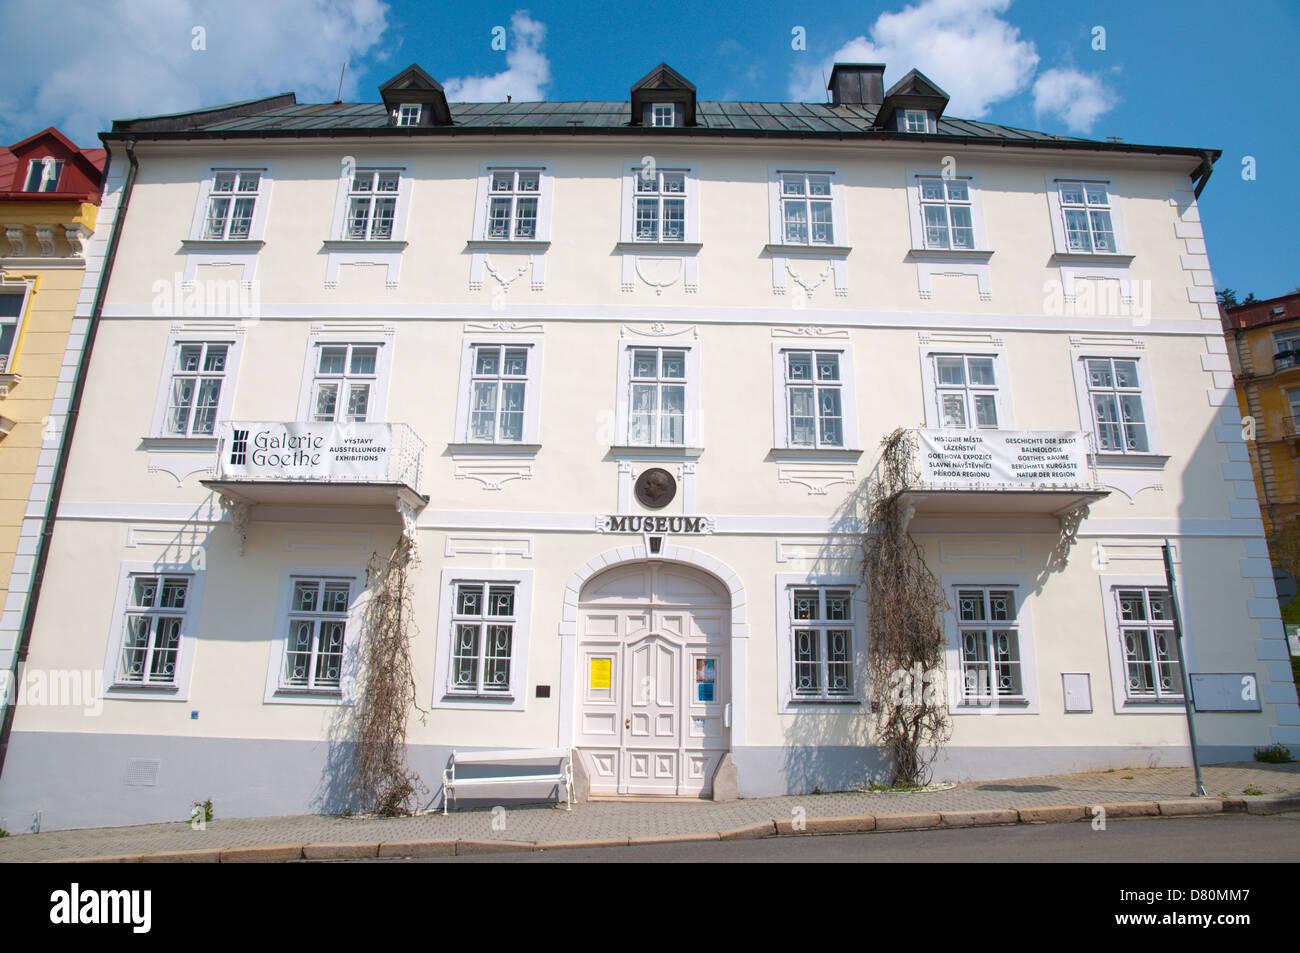 Mestske muzeum the Municipal museum exterior Goethovo namesti square Marianske Lazne aka Marienbad Karlovy vary - Stock Image